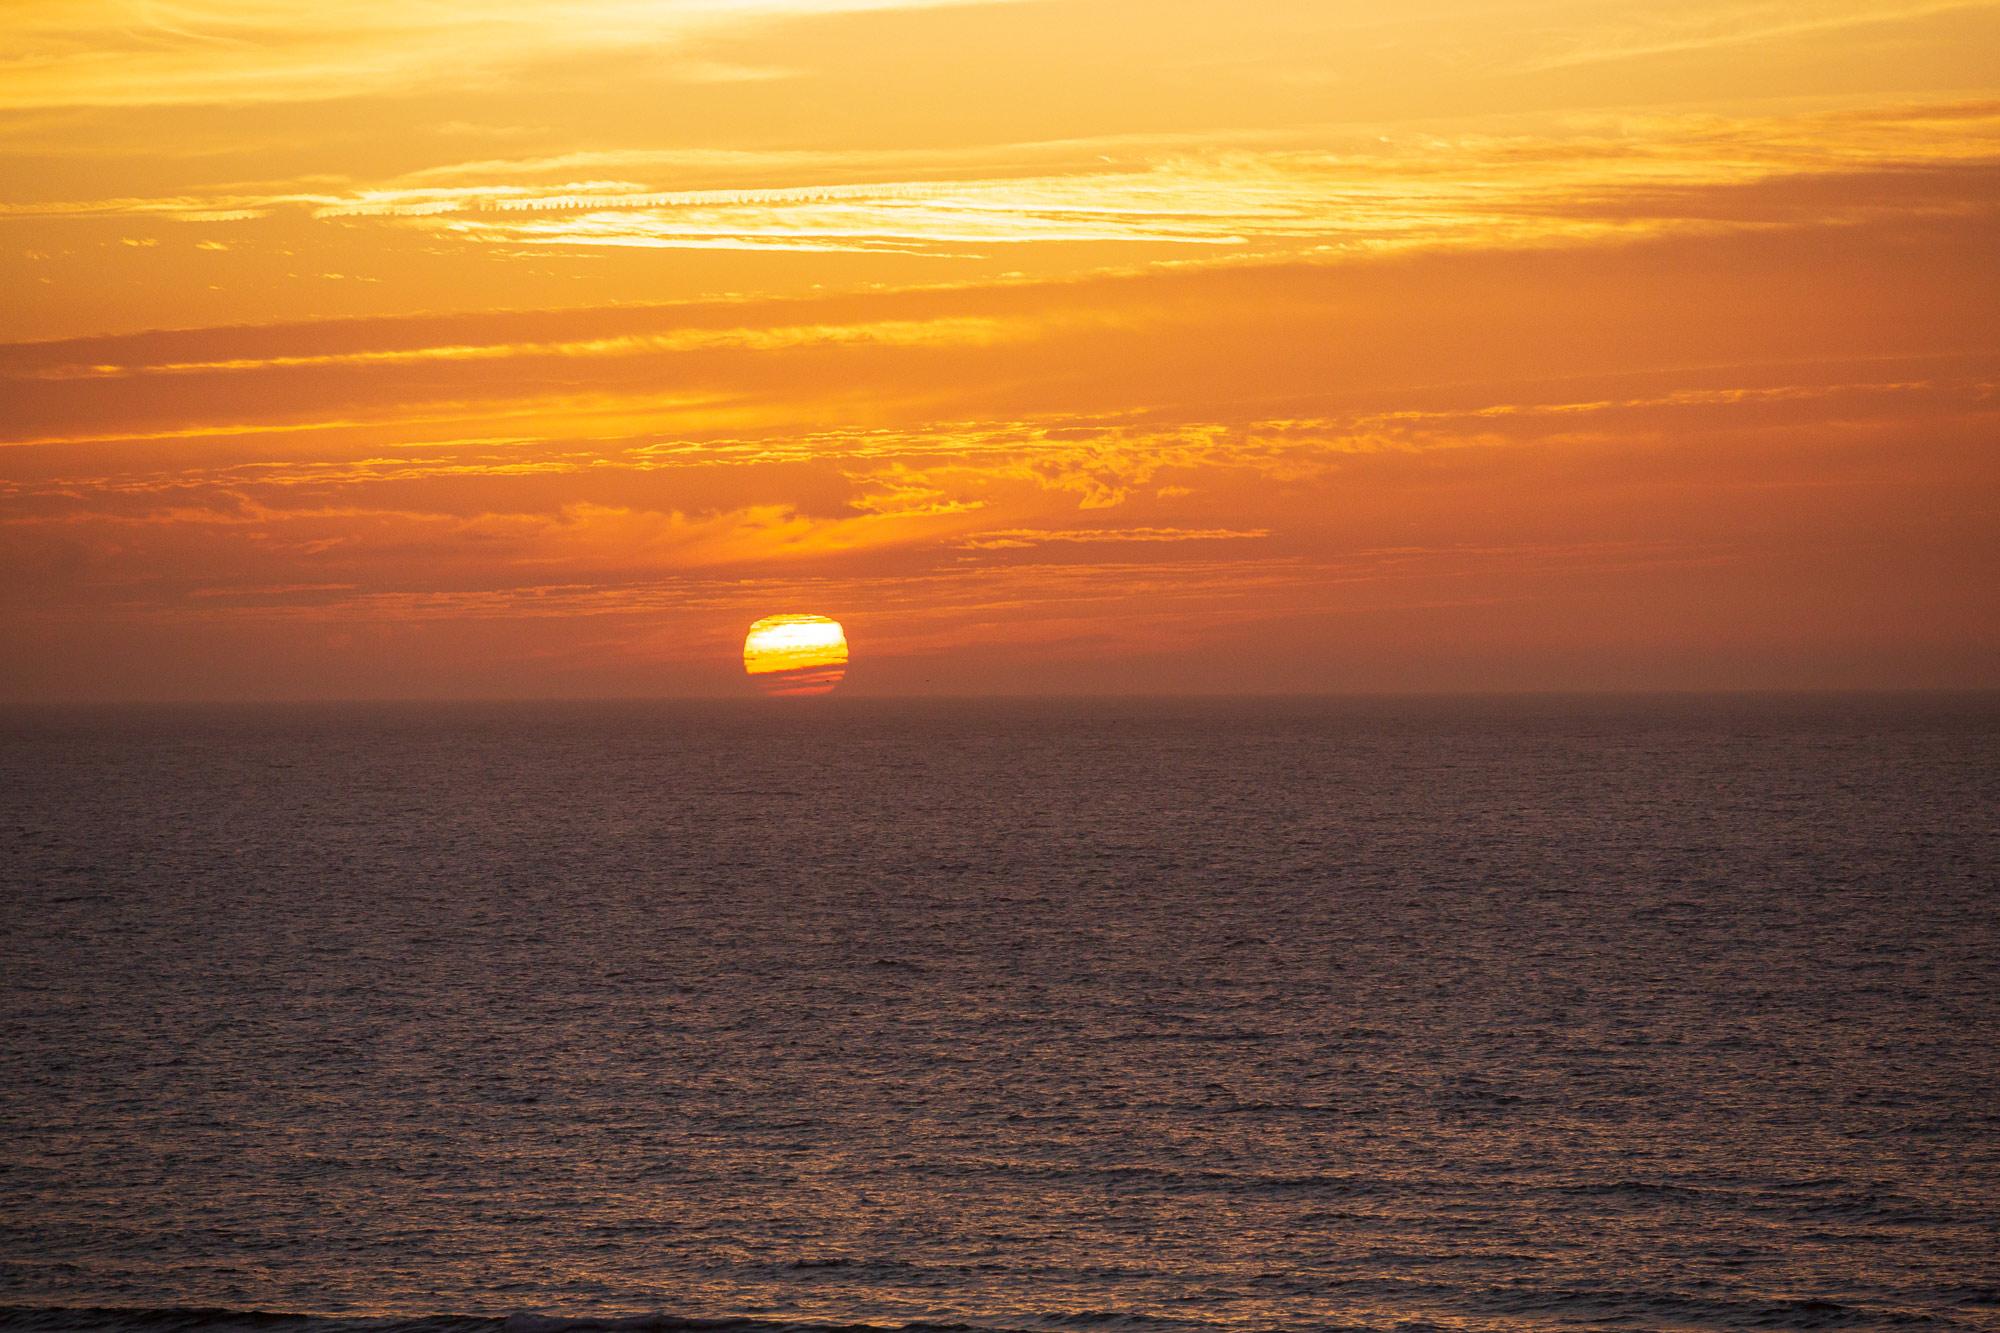 Trek au Maroc coucher de soleil